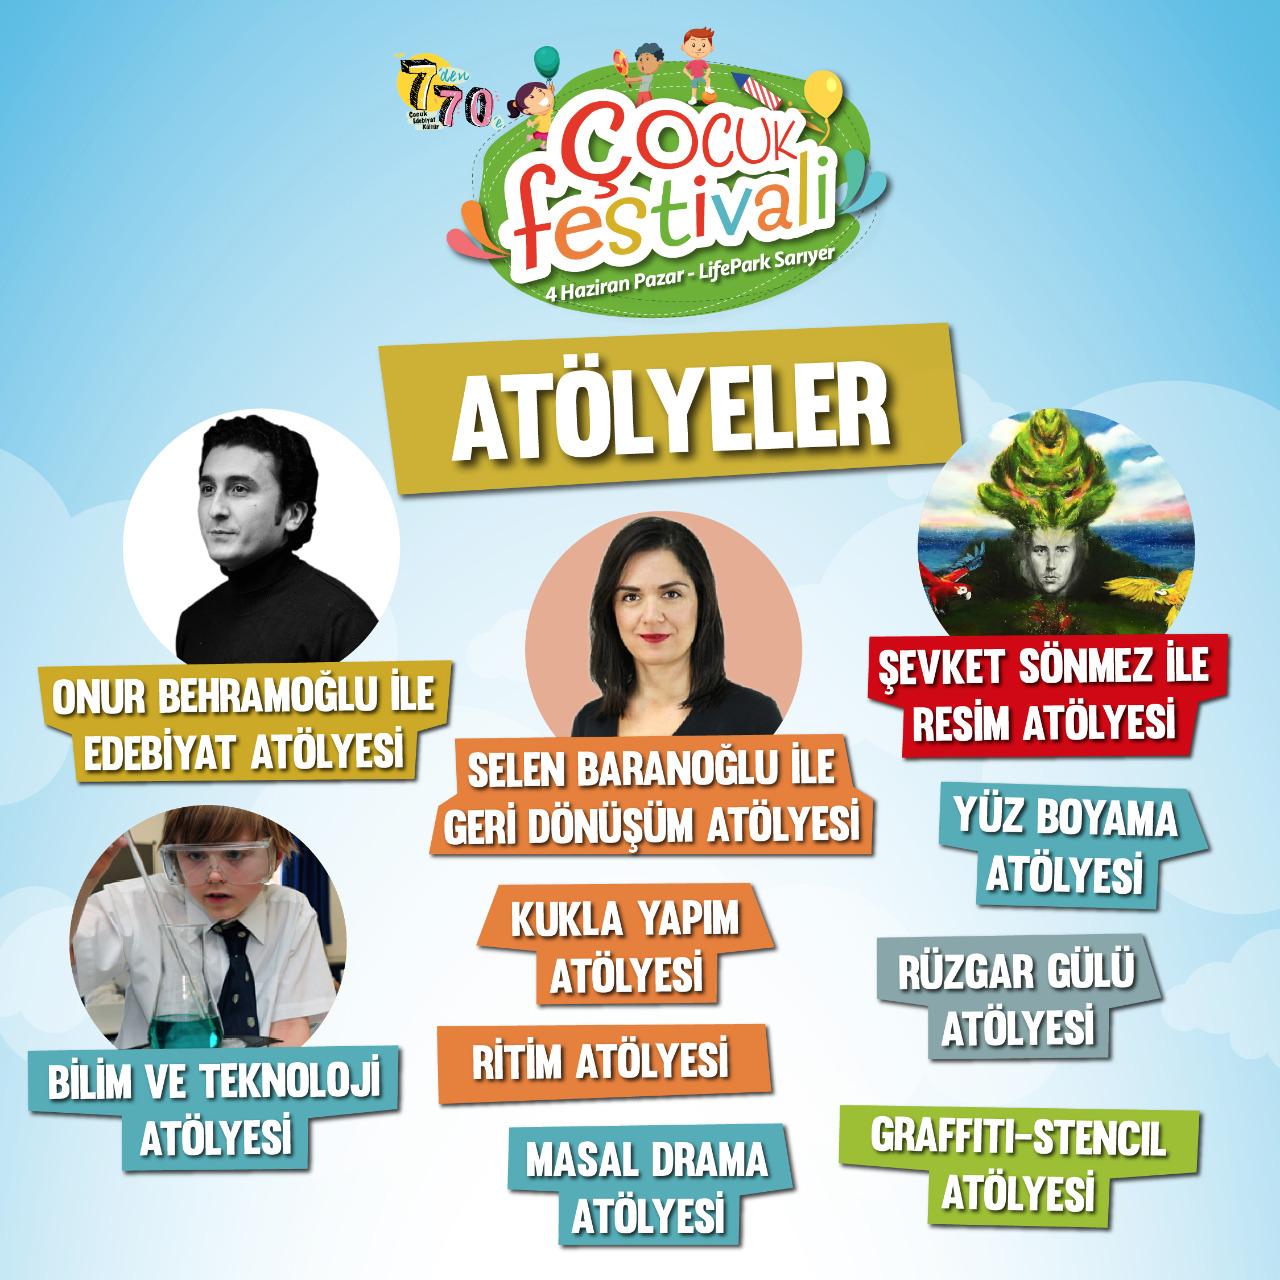 cocuk festivali atolyeler